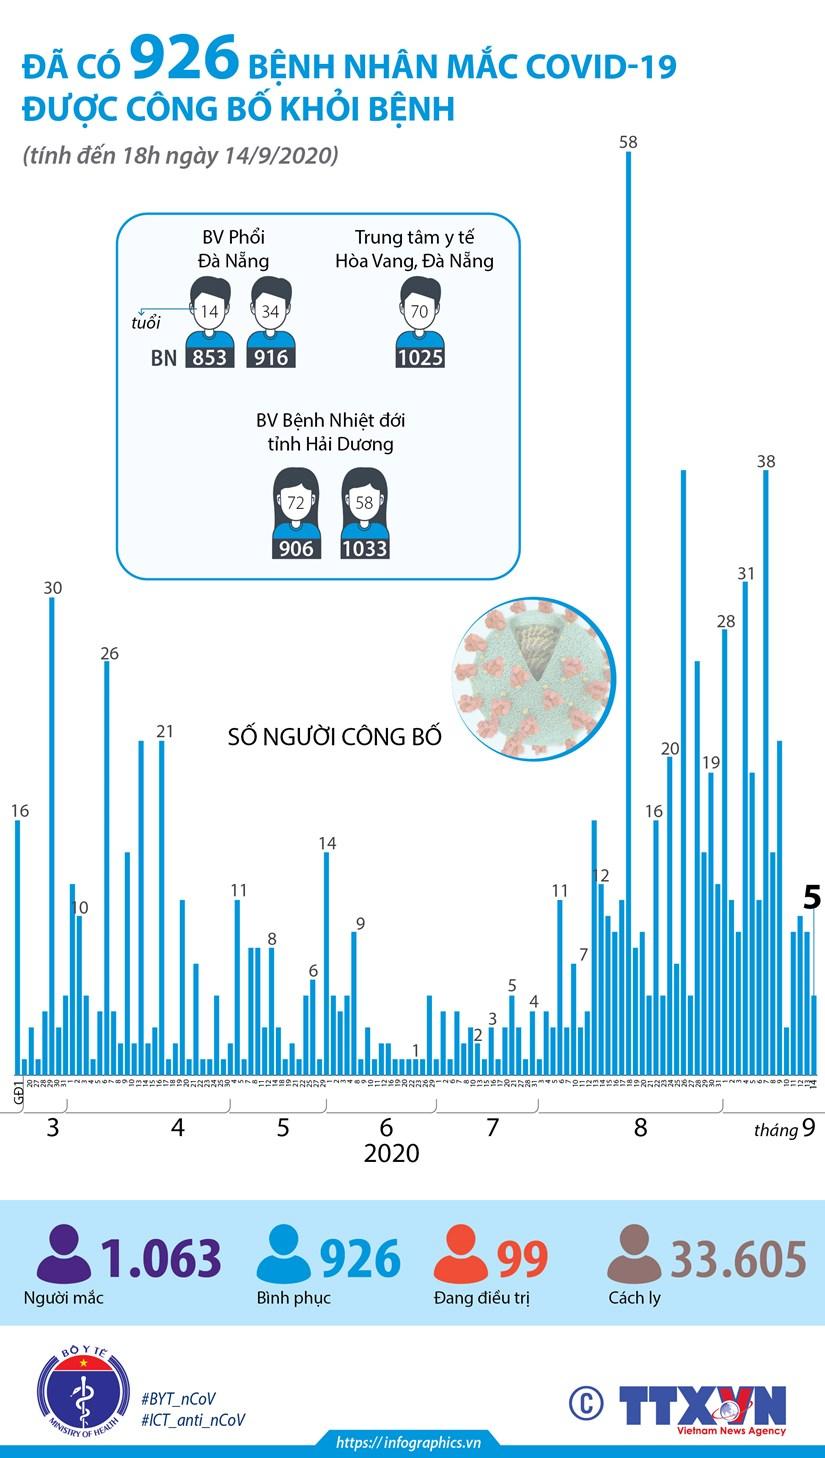 [Infographics] Da co 926 benh nhan mac COVID-19 duoc cong bo khoi benh hinh anh 1